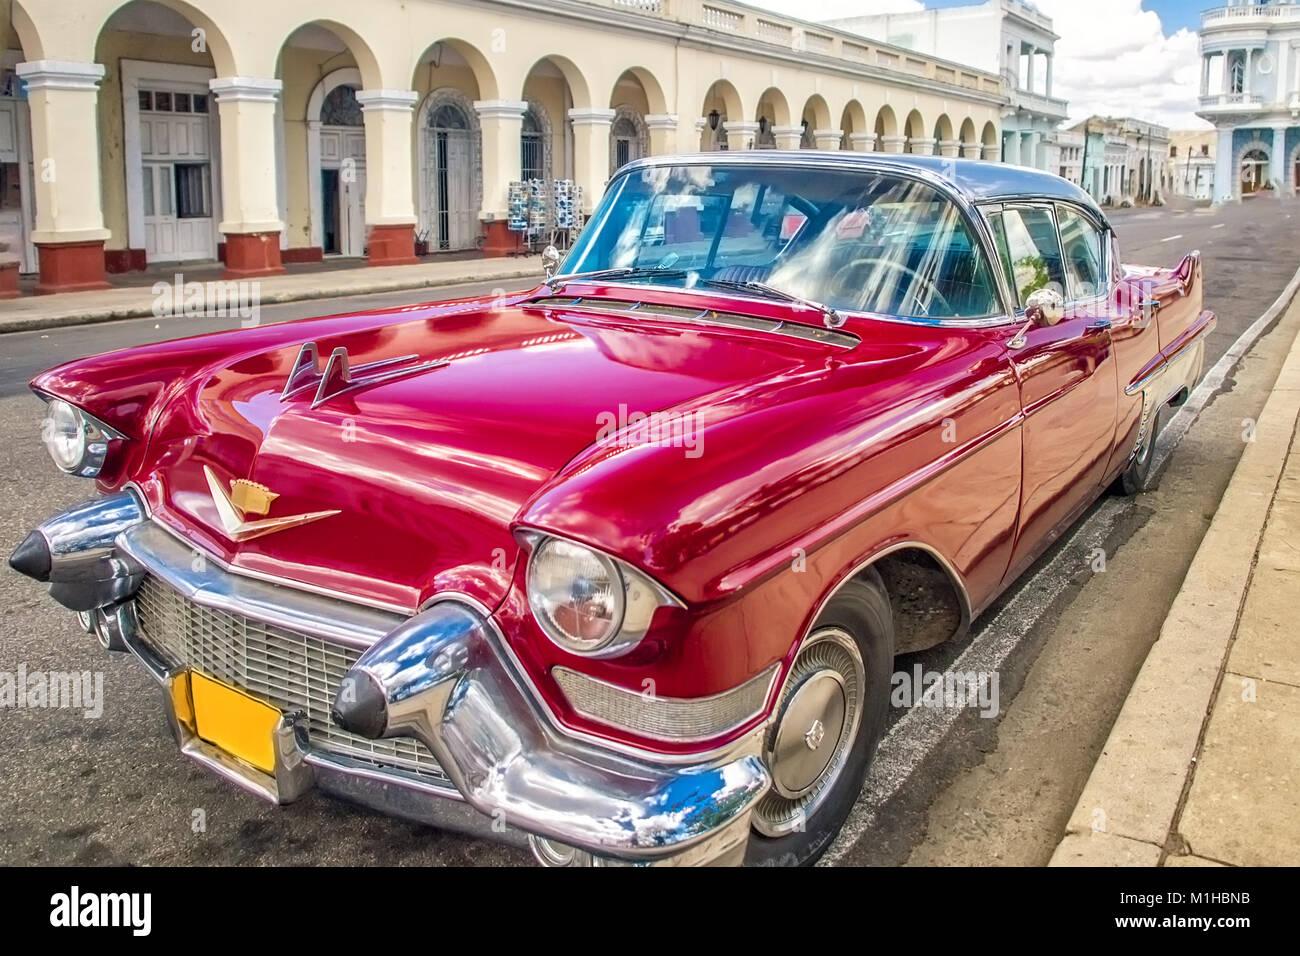 Cienfuegos , CUBA - 22 MARCH 2012 : Red Old retro Car on authentic ...